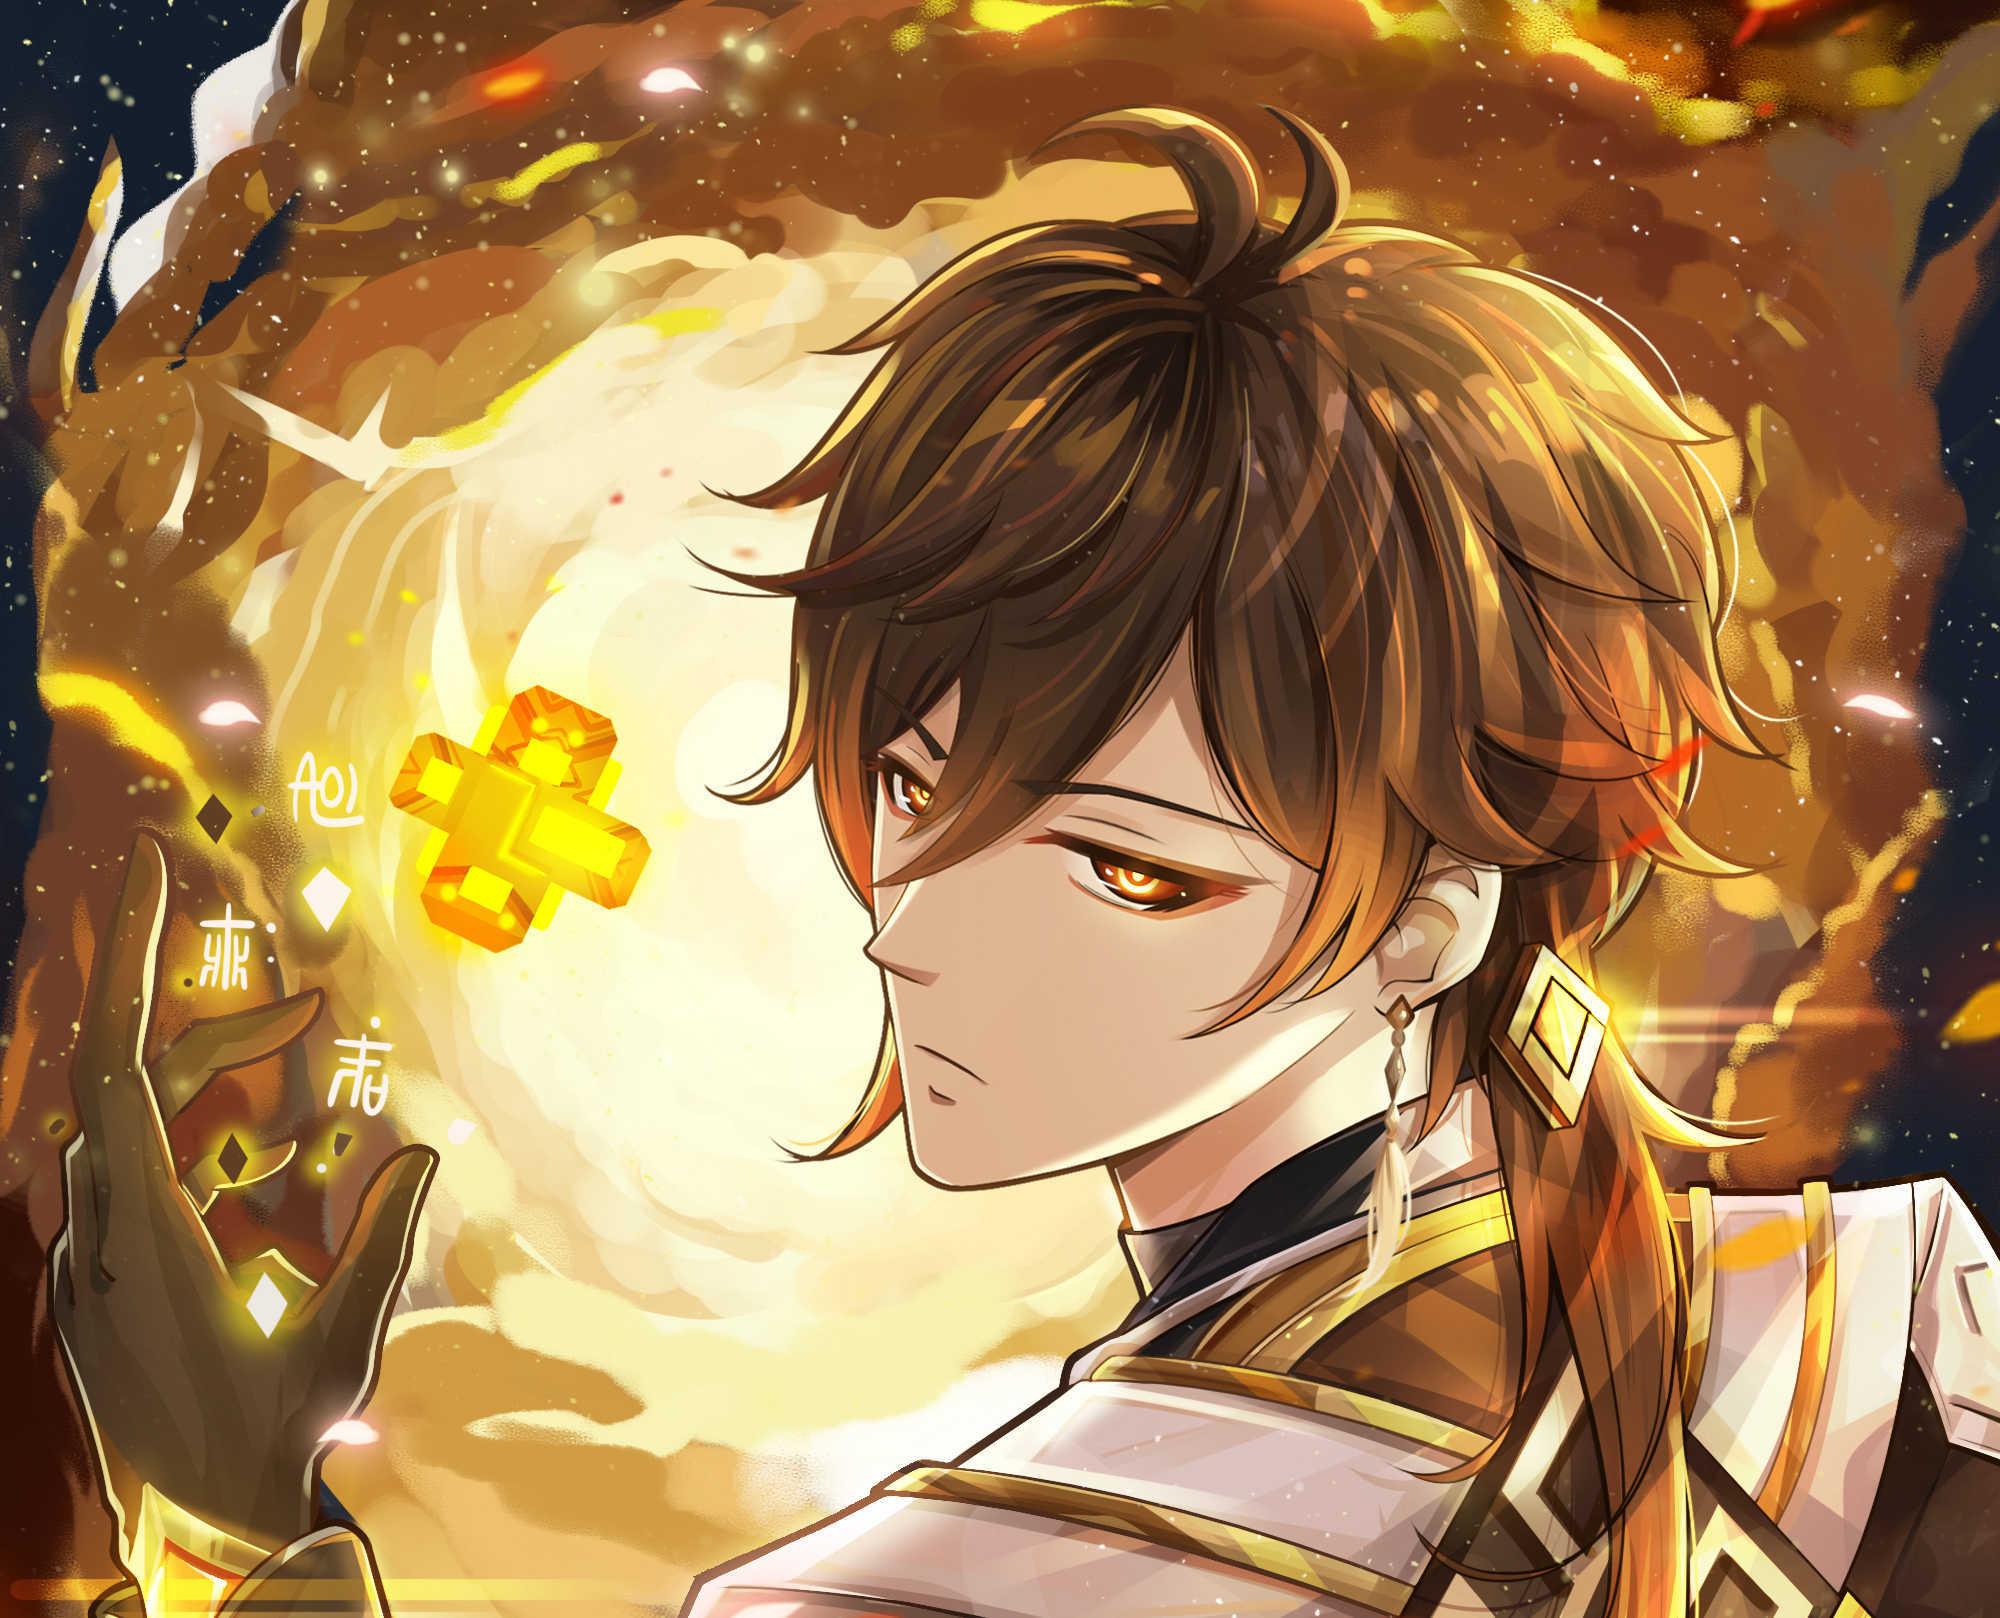 Genshin Impact Release Date Details Genshin Impact Wallpaper Hd Supertab Themes All